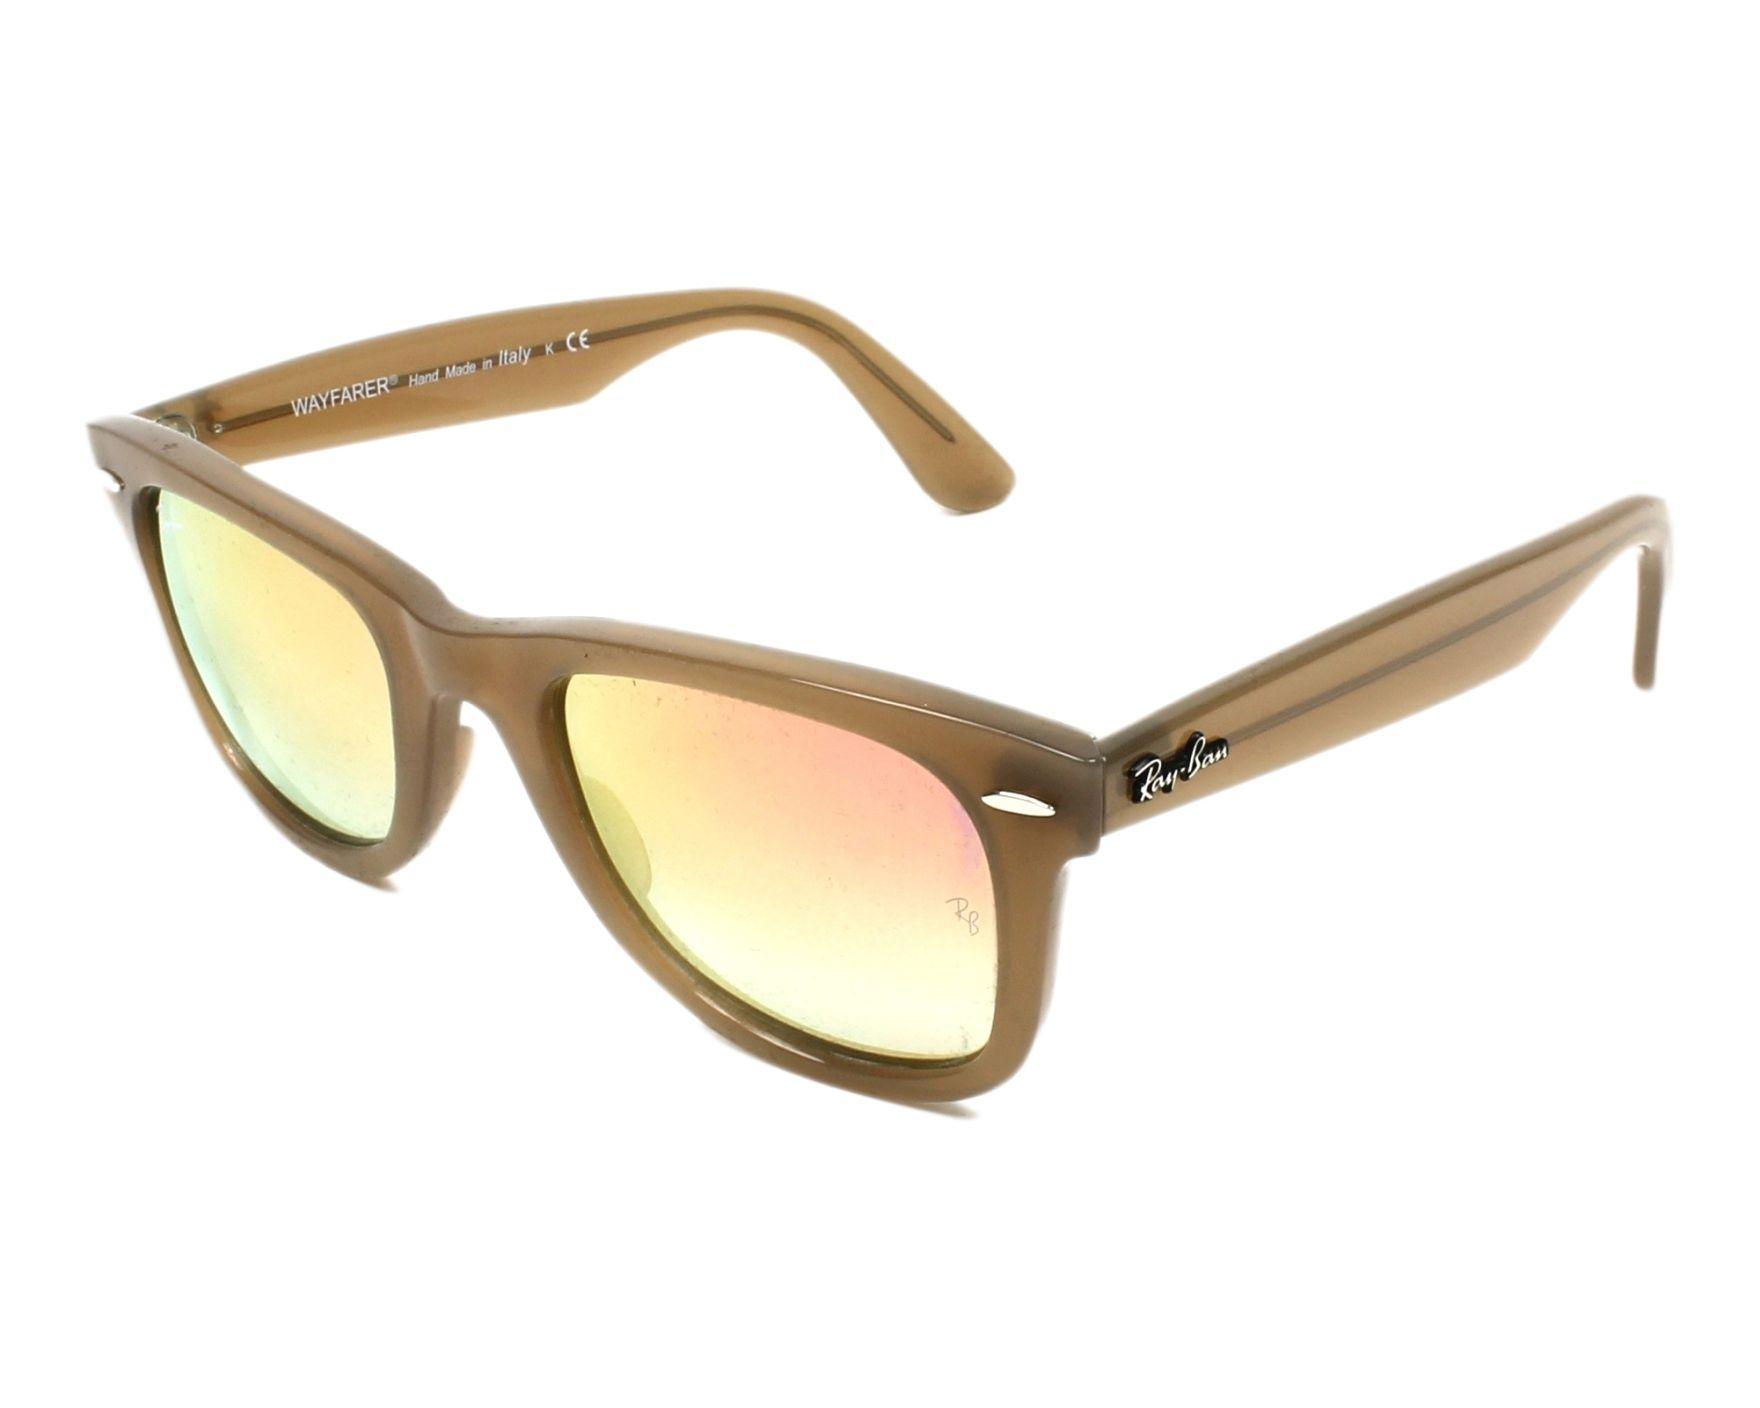 Ray-Ban RB4340 Sonnenbrille Beige 61667Y 50mm EfapOk